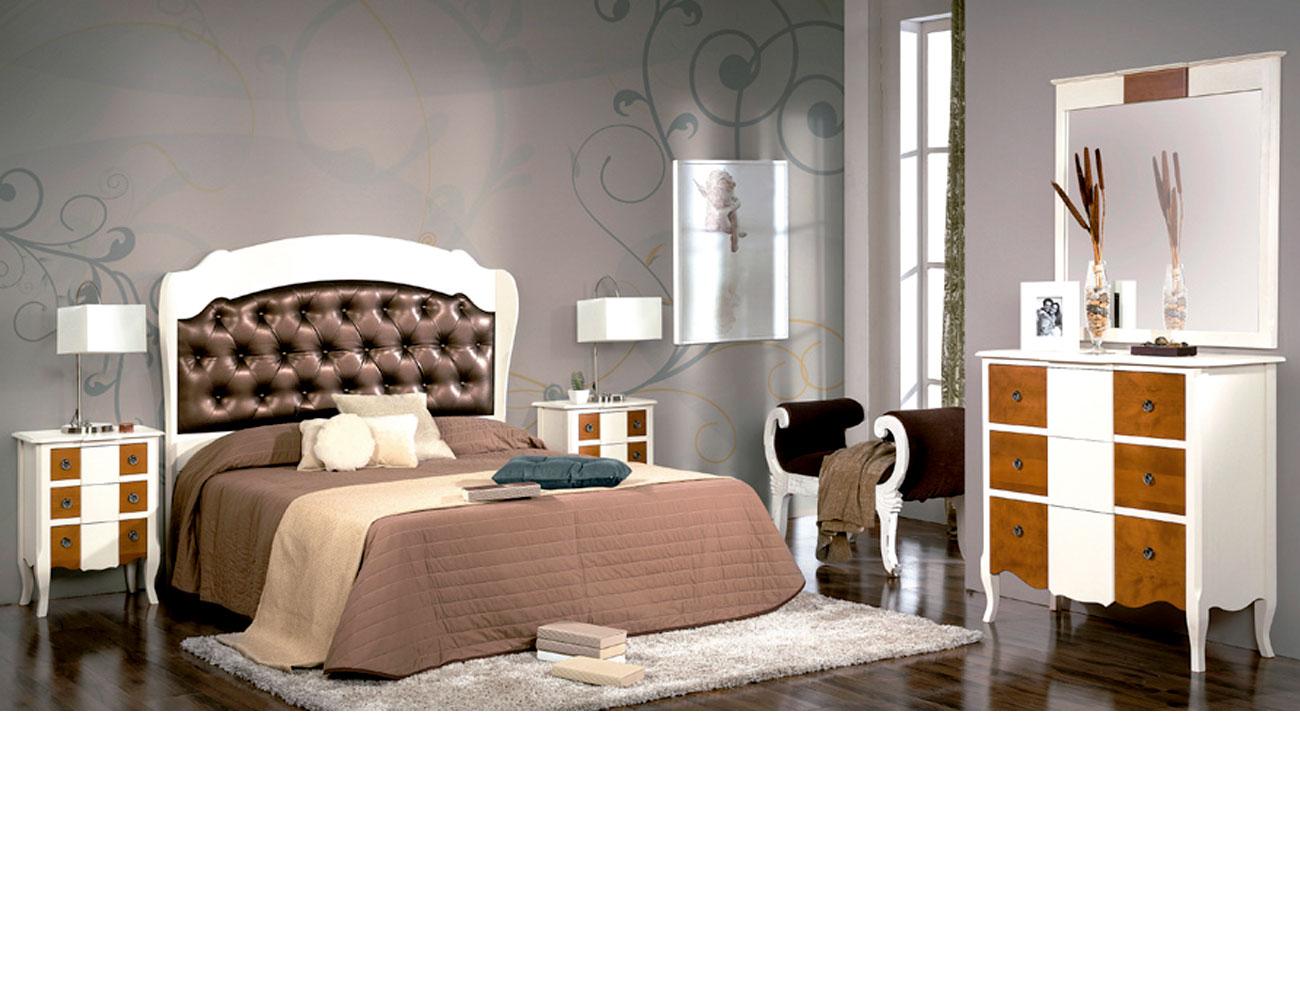 Dormitorios Modernos Tapizados Dormitorios Cabeceros Tapizados